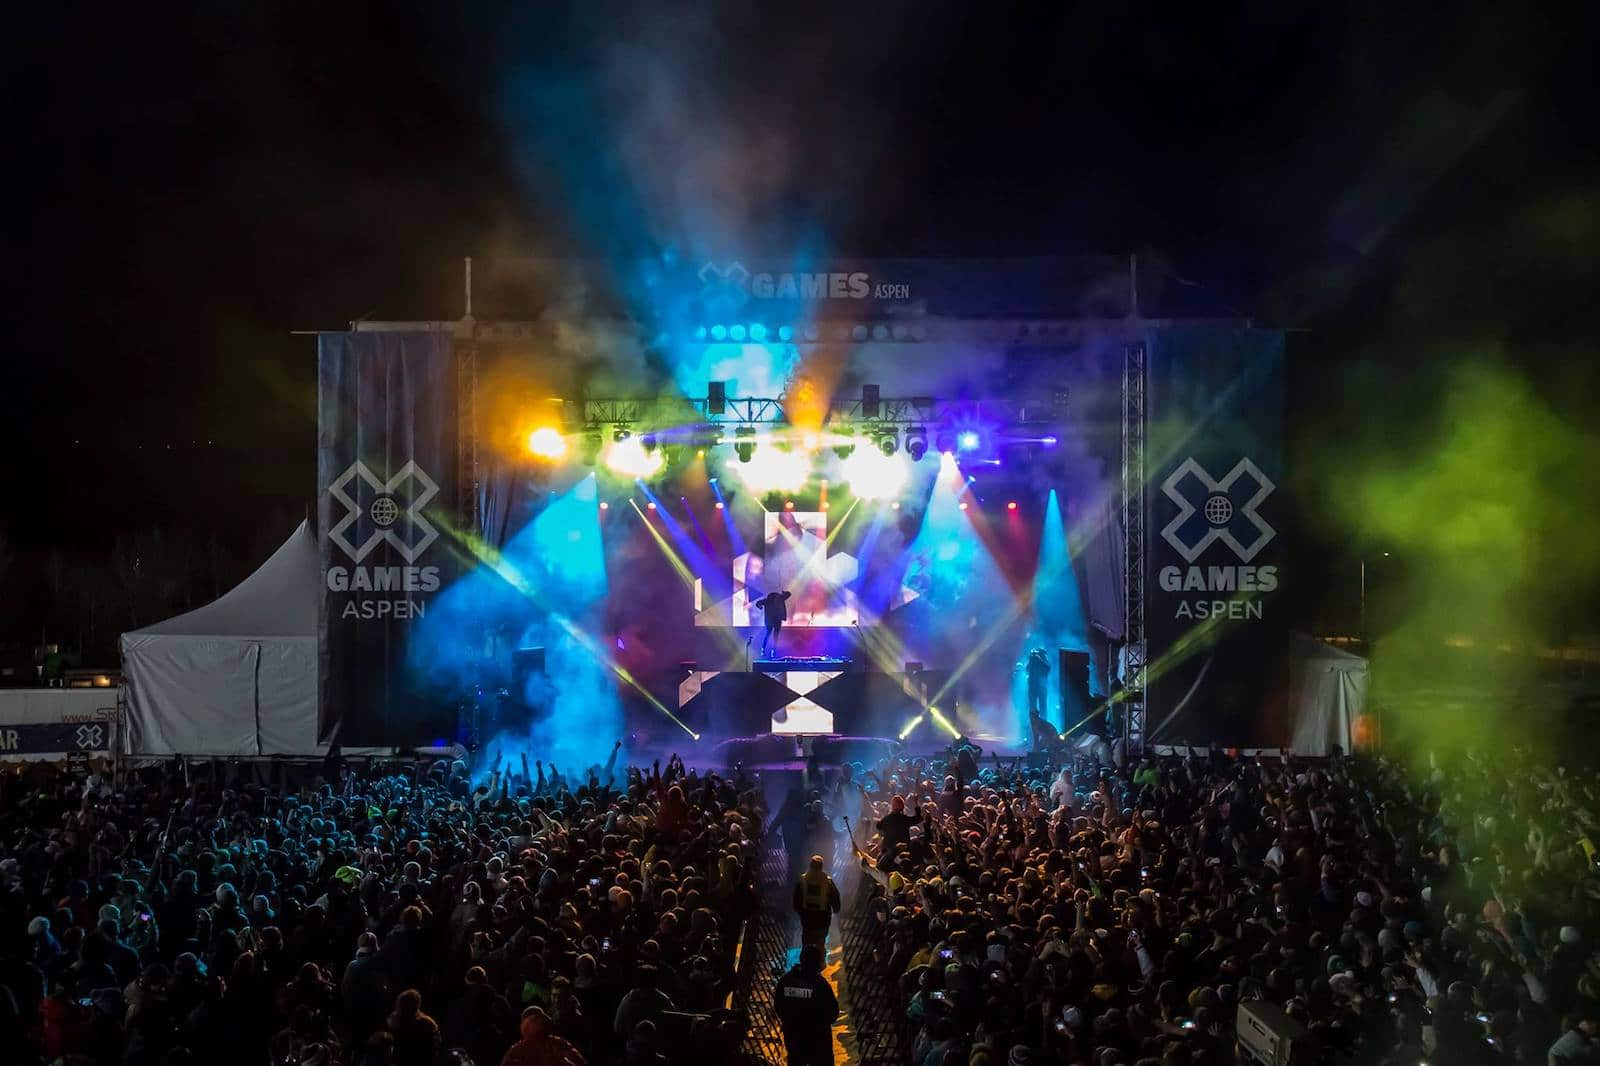 Gambar panggung Aspen X Games di Colorado